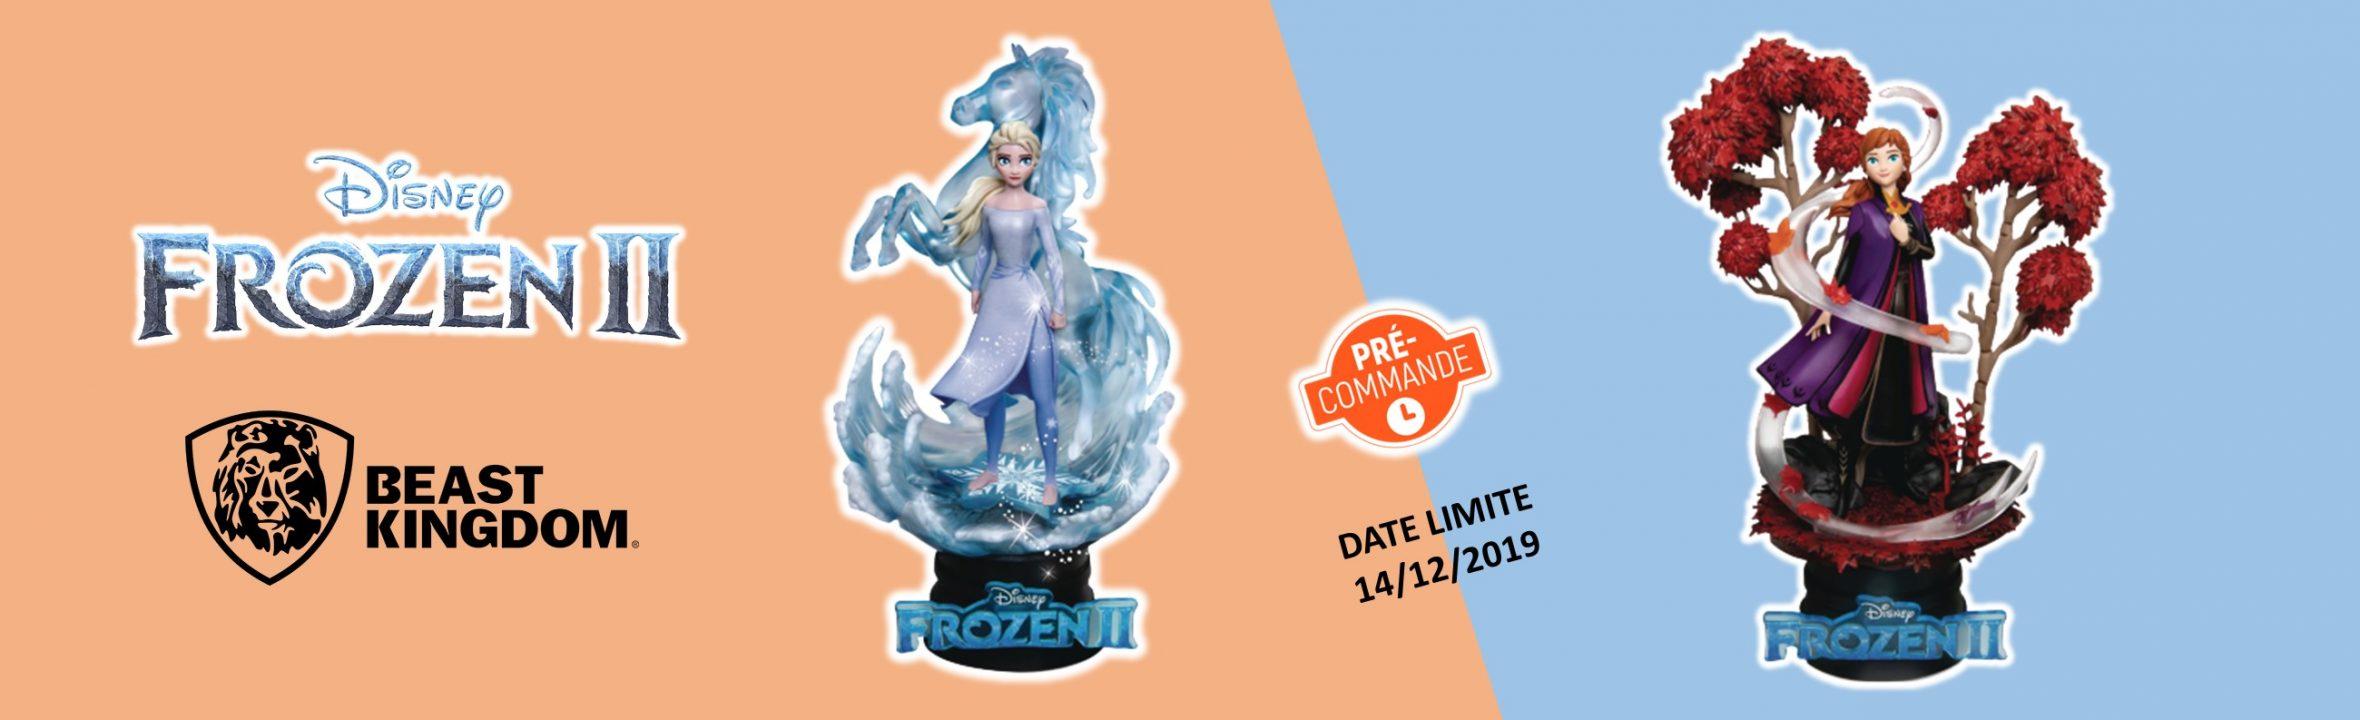 preco diorama La reine des neiges 2 disney